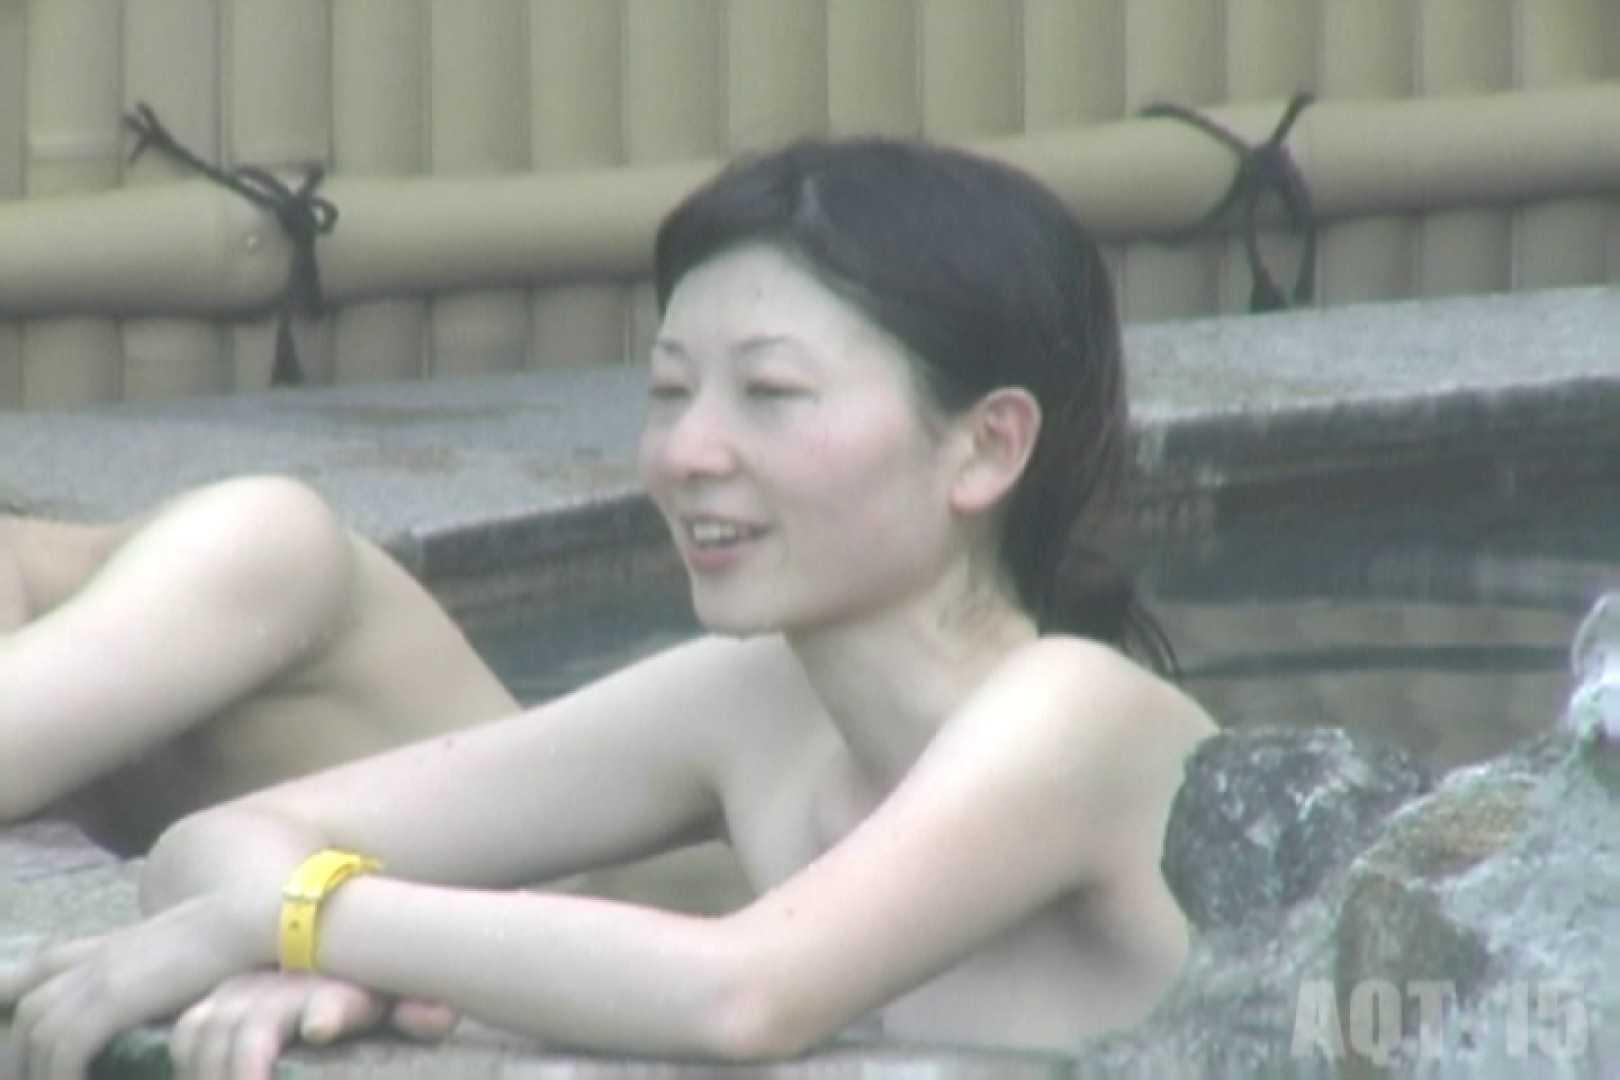 Aquaな露天風呂Vol.835 露天風呂 スケベ動画紹介 65連発 11